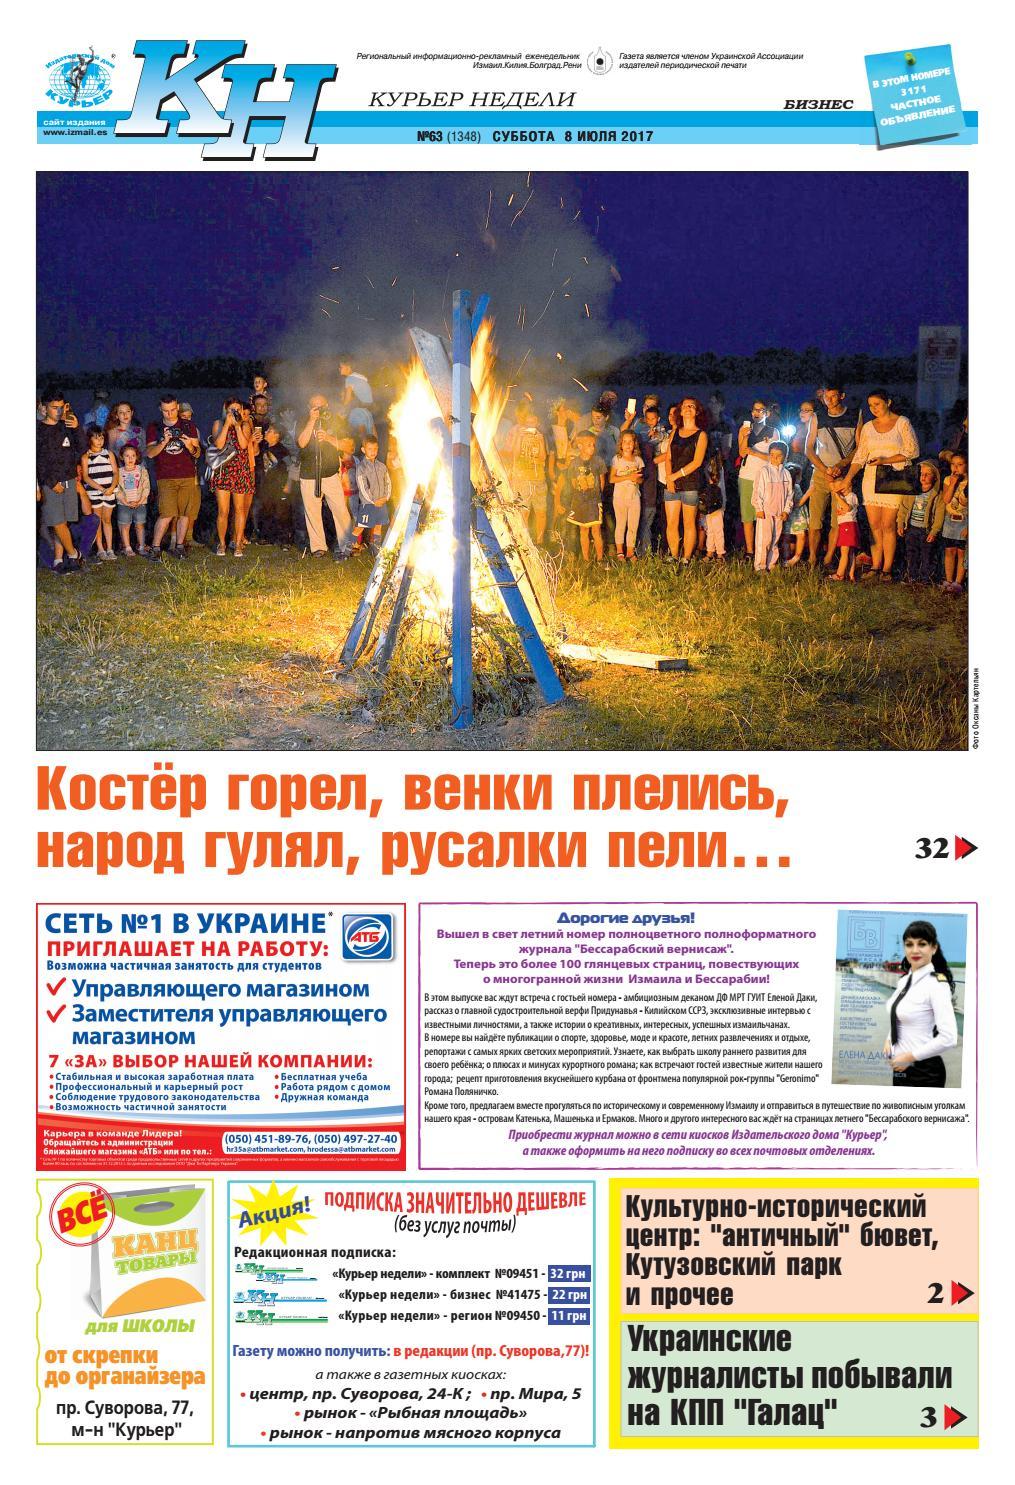 buharskiy-bay-vedut-seks